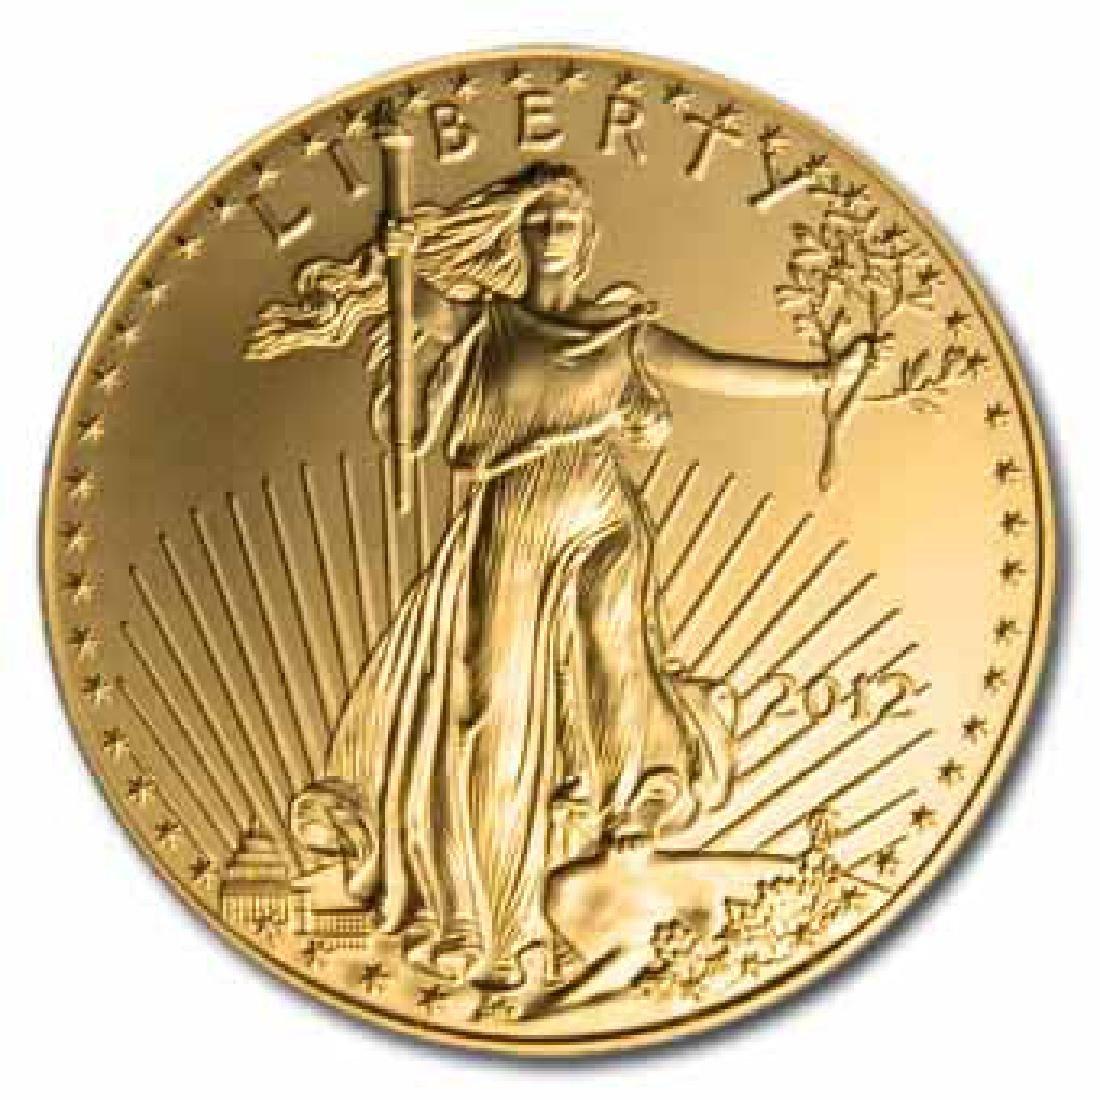 2012 American Gold Eagle 1oz Uncirculated